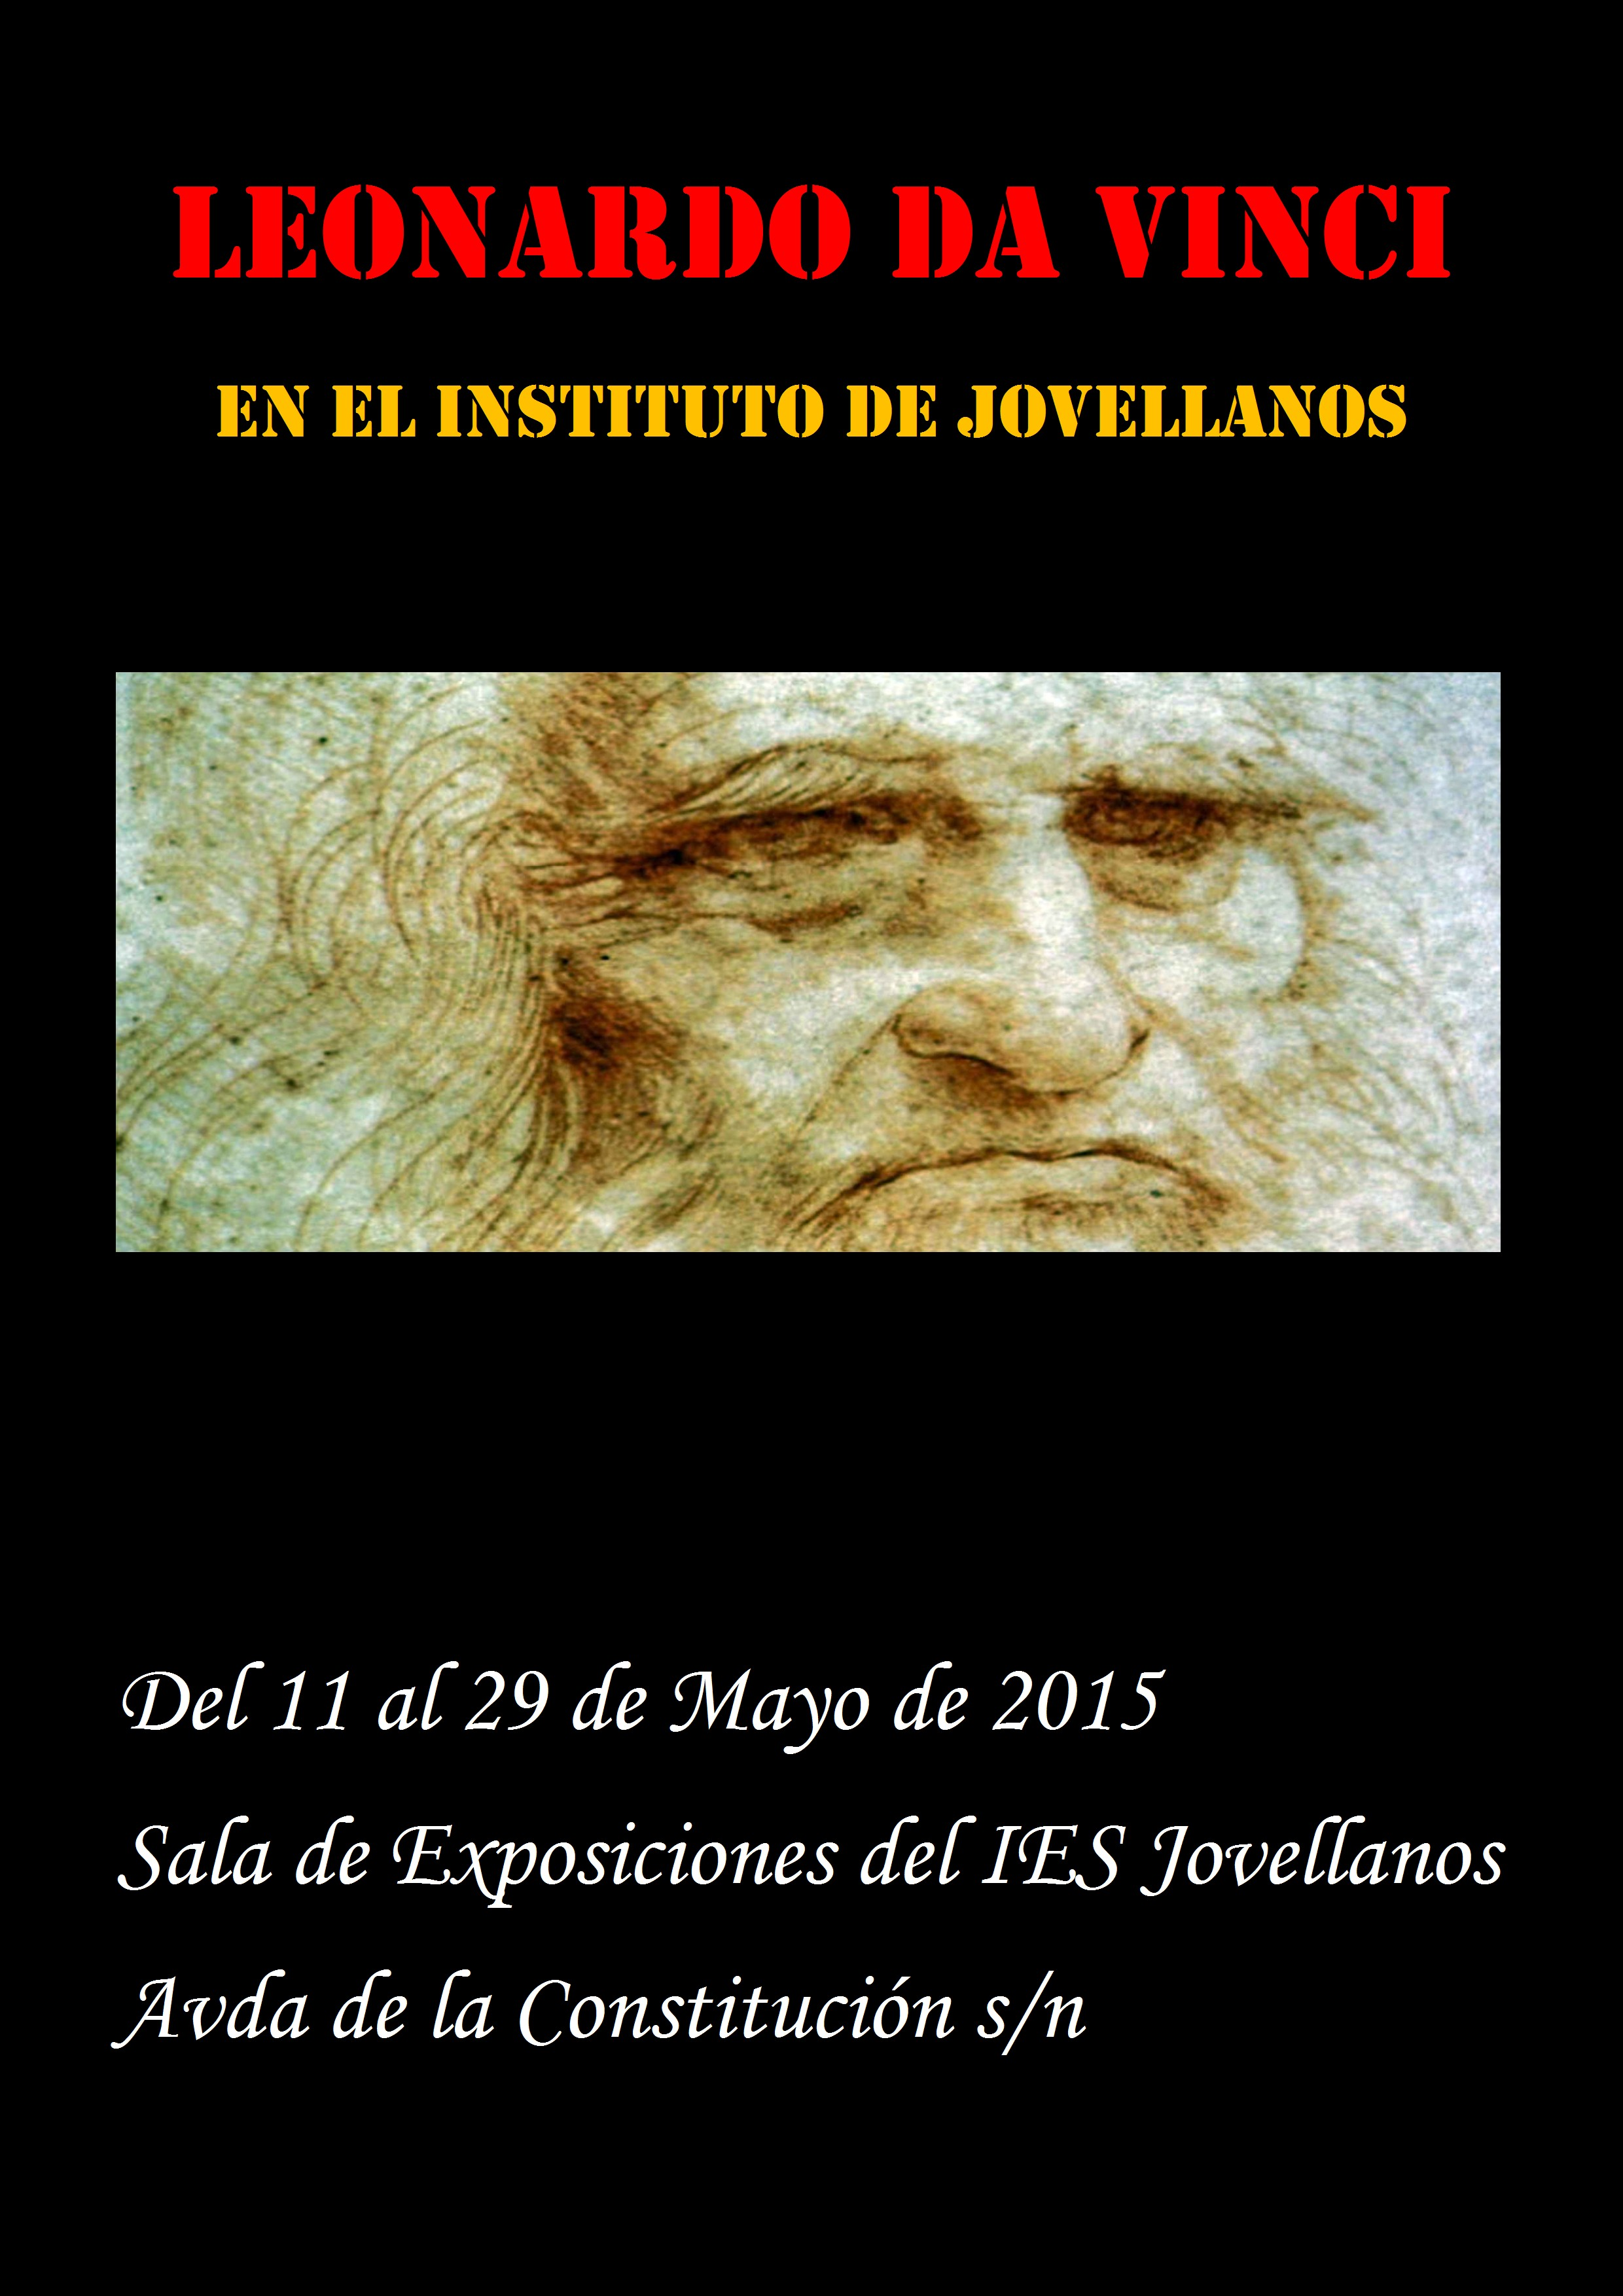 Leonardo Da Vinci en el Instituto Jovellanos